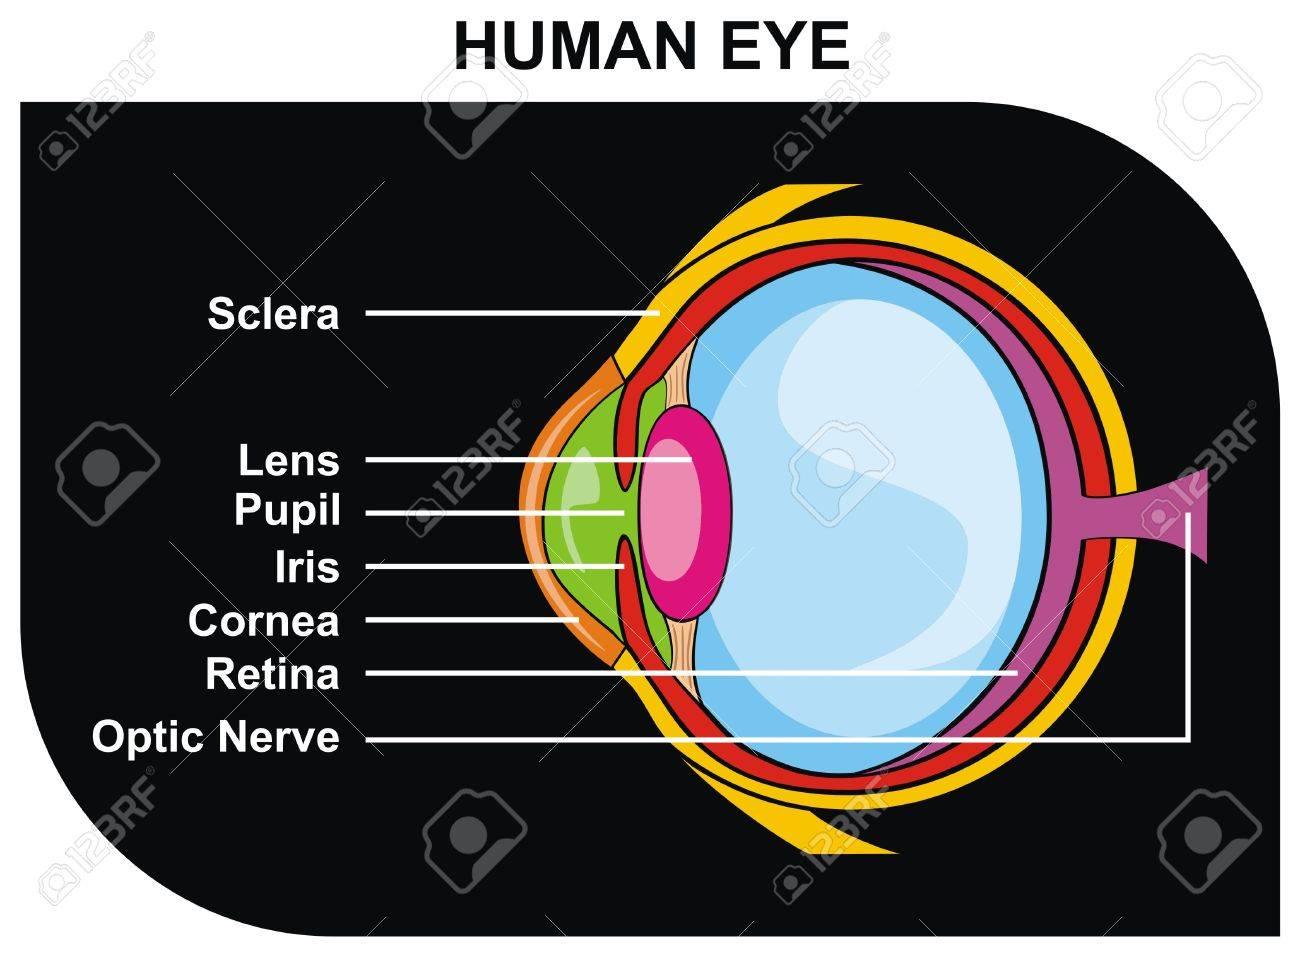 hight resolution of vector human eye cross section including eye parts sclera lens pupil iris cornea retina optic nerve